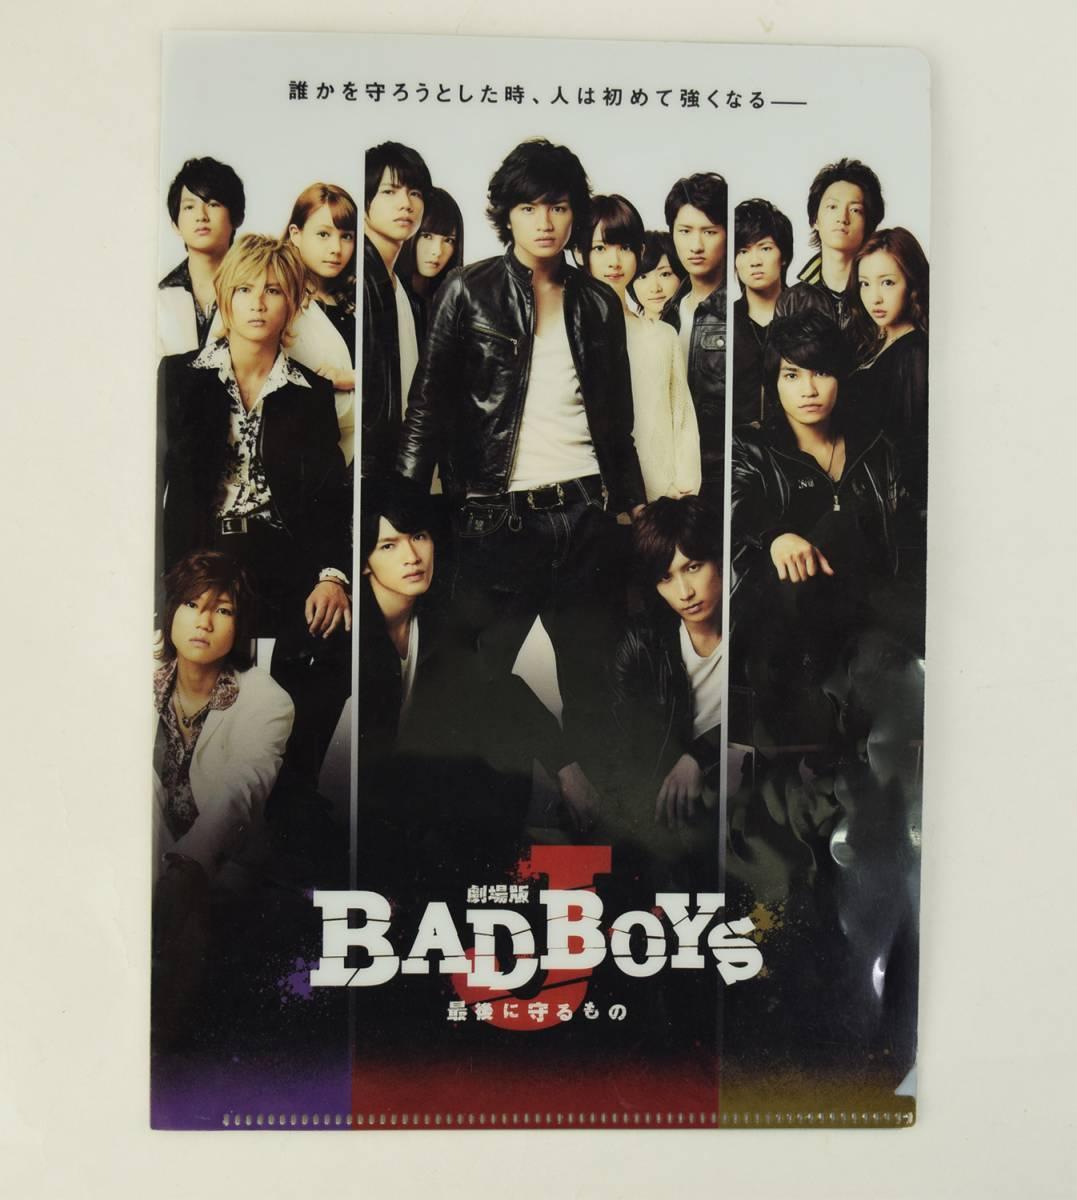 △335D/劇場版BAD BOYS J ~最後に守るもの~ ミニクリアファイル 中島健人 約15.3cm×約21.8cm